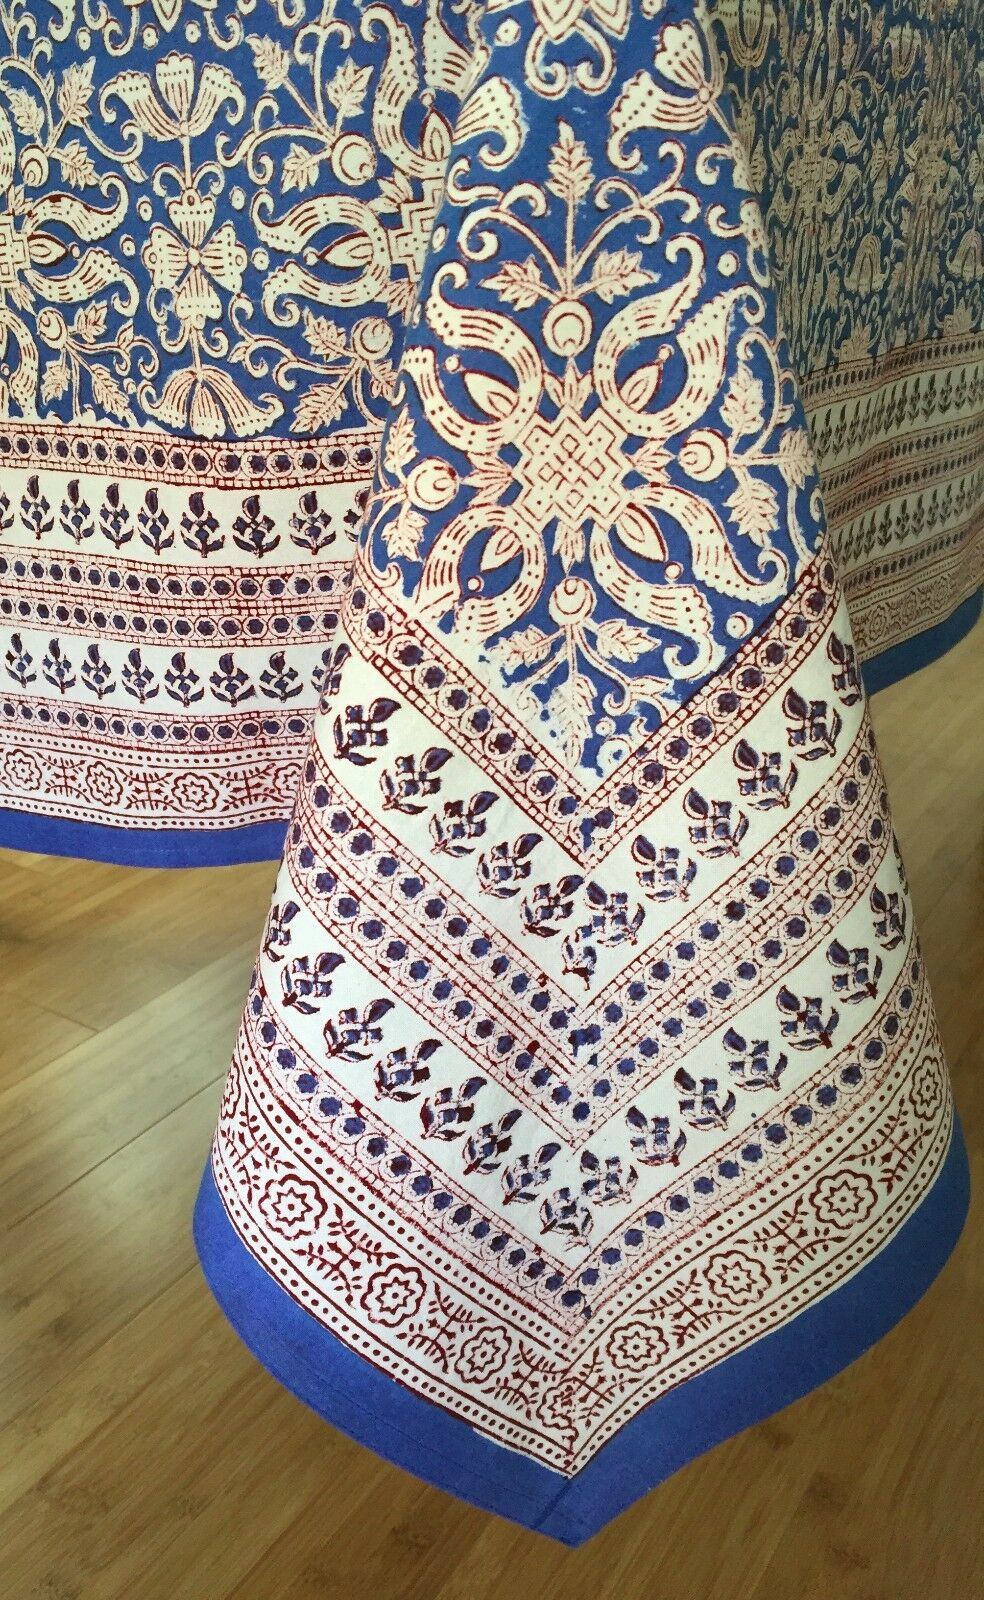 Anokhi bleu & blanc Floral Cotton Tablecloth, 70 x108